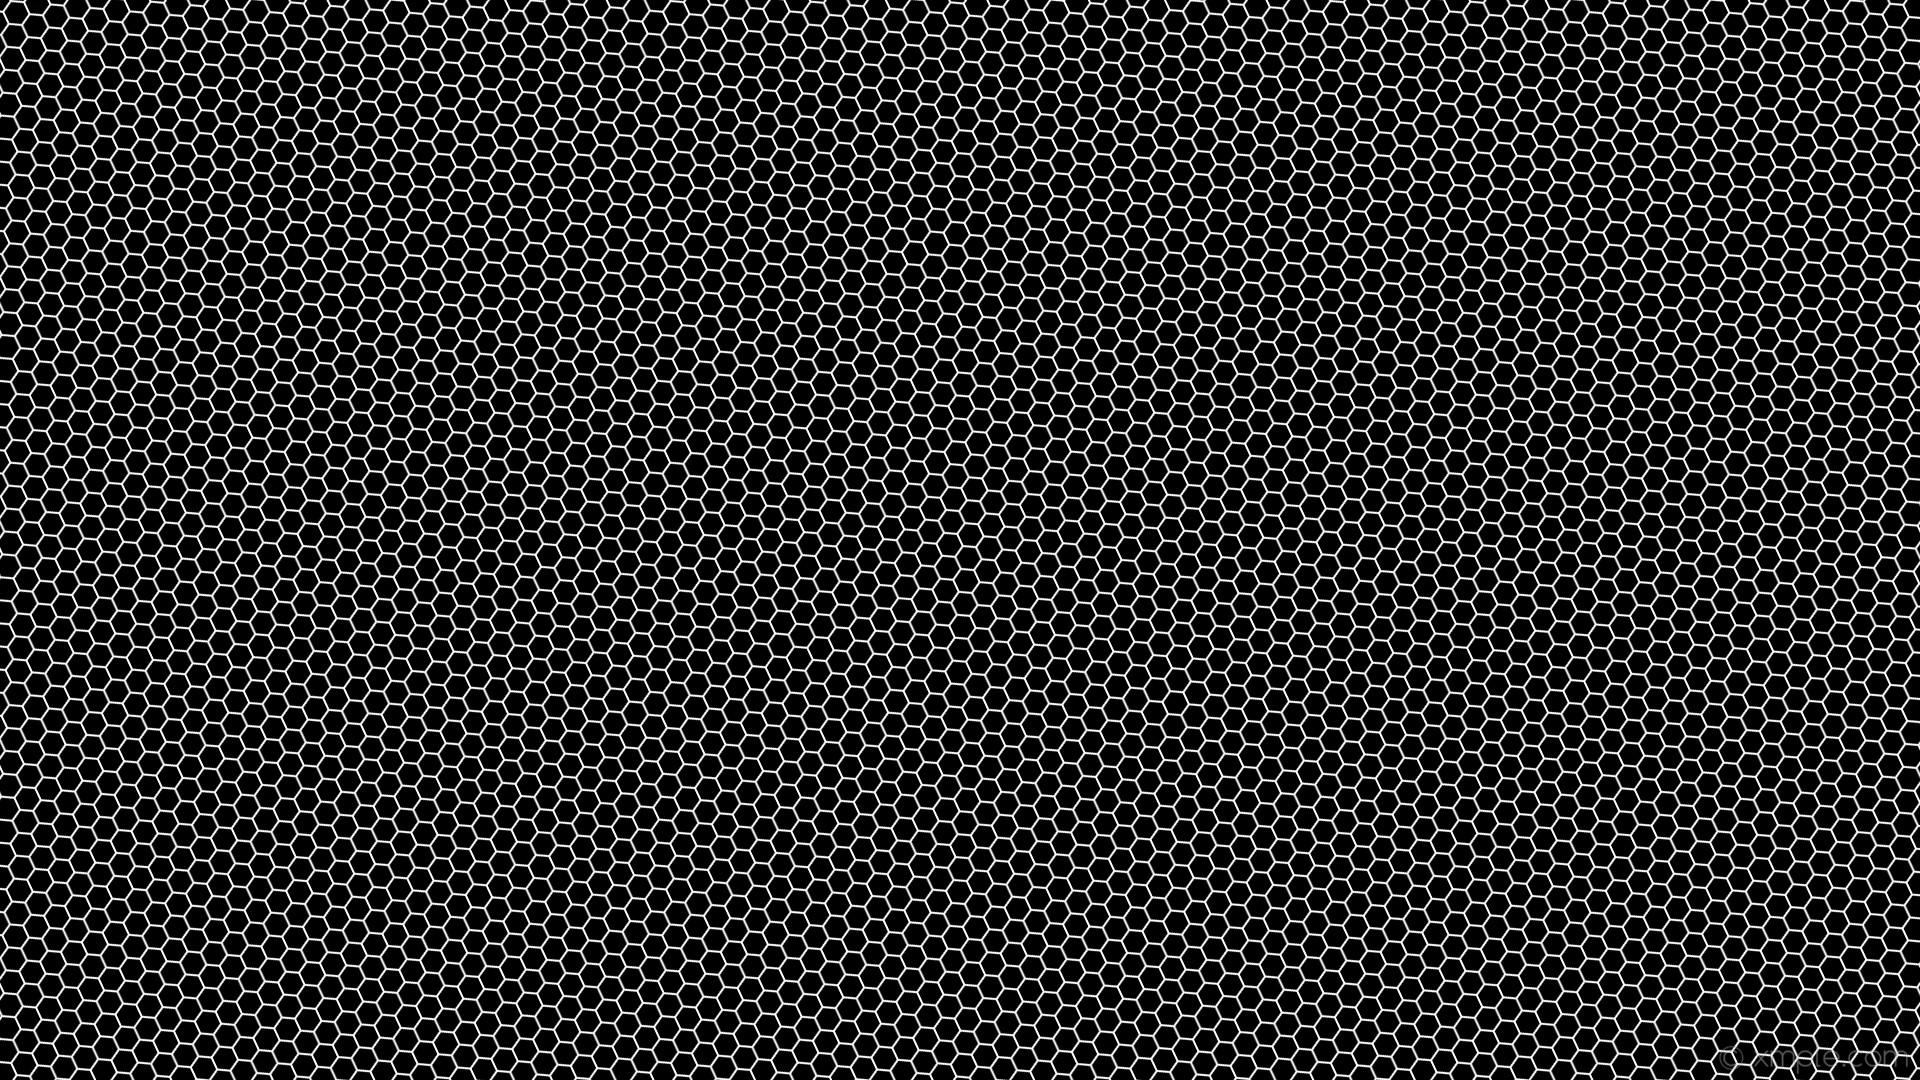 wallpaper honeycomb white beehive hexagon black #000000 #ffffff diagonal  25° 2px 23px